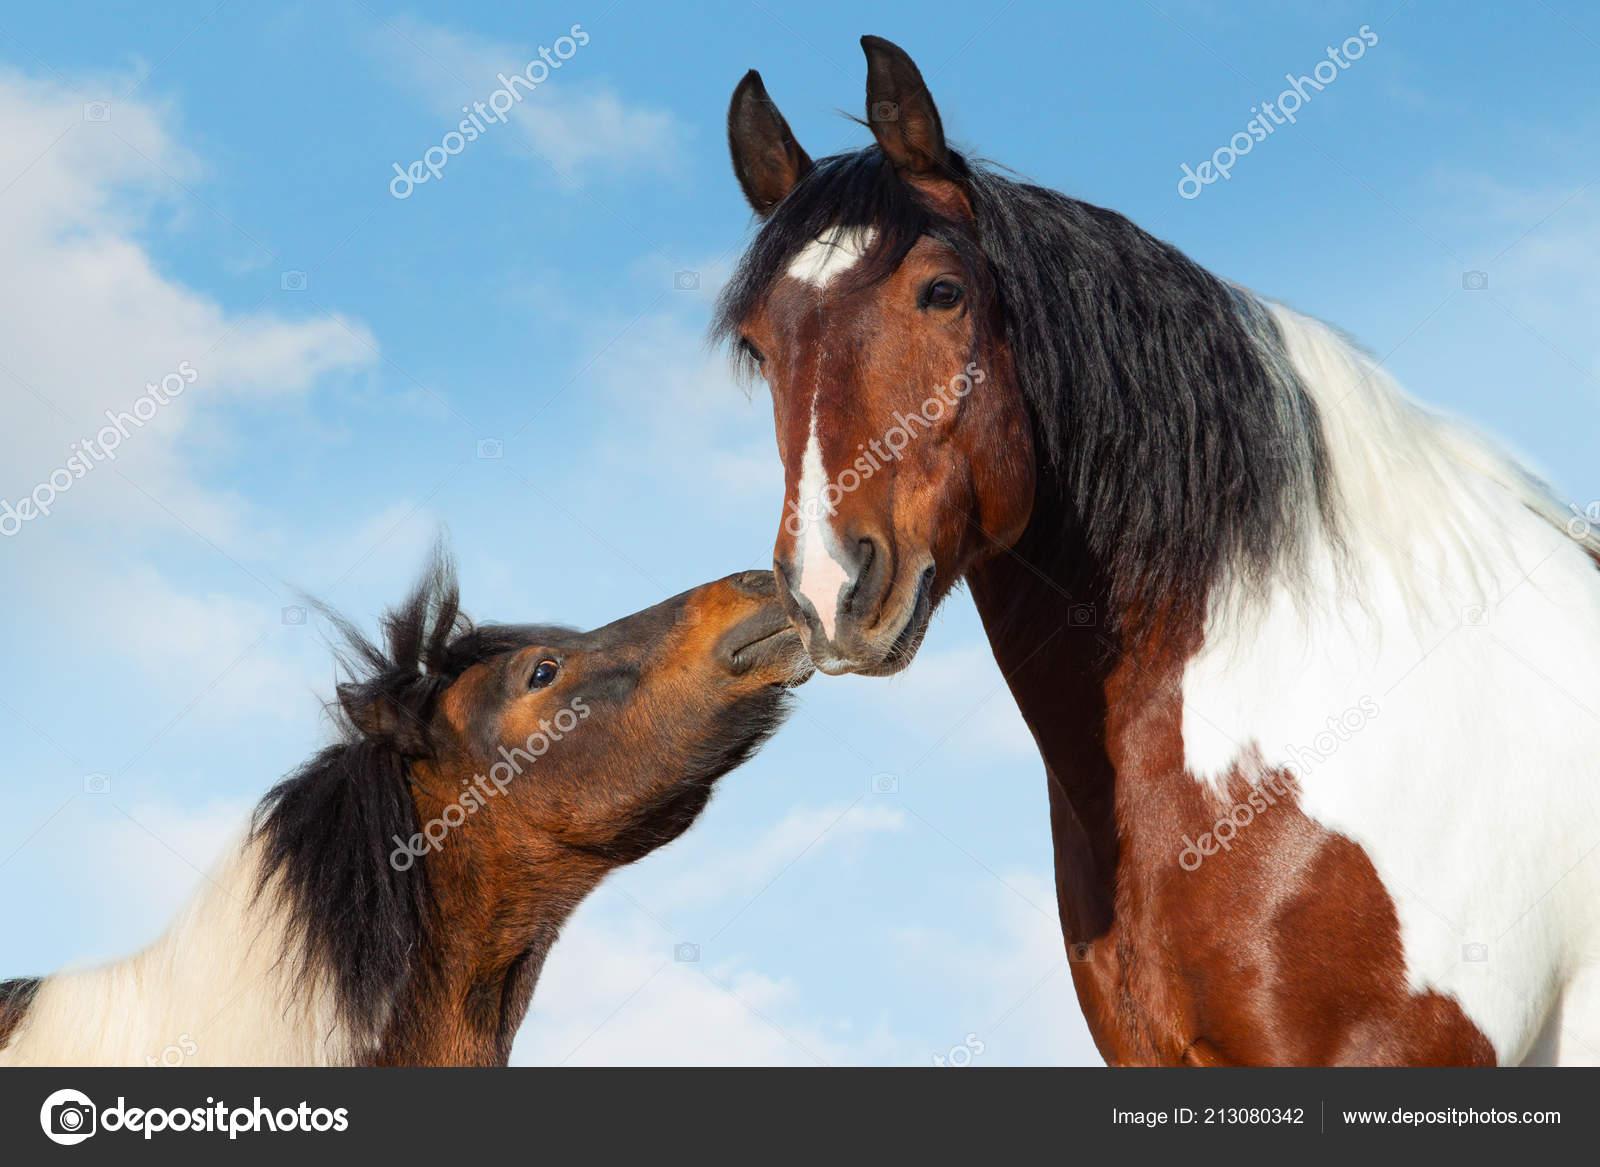 Koncepce Pinto Shetlend Pony Polibi Velke Sedlo Kone Stock